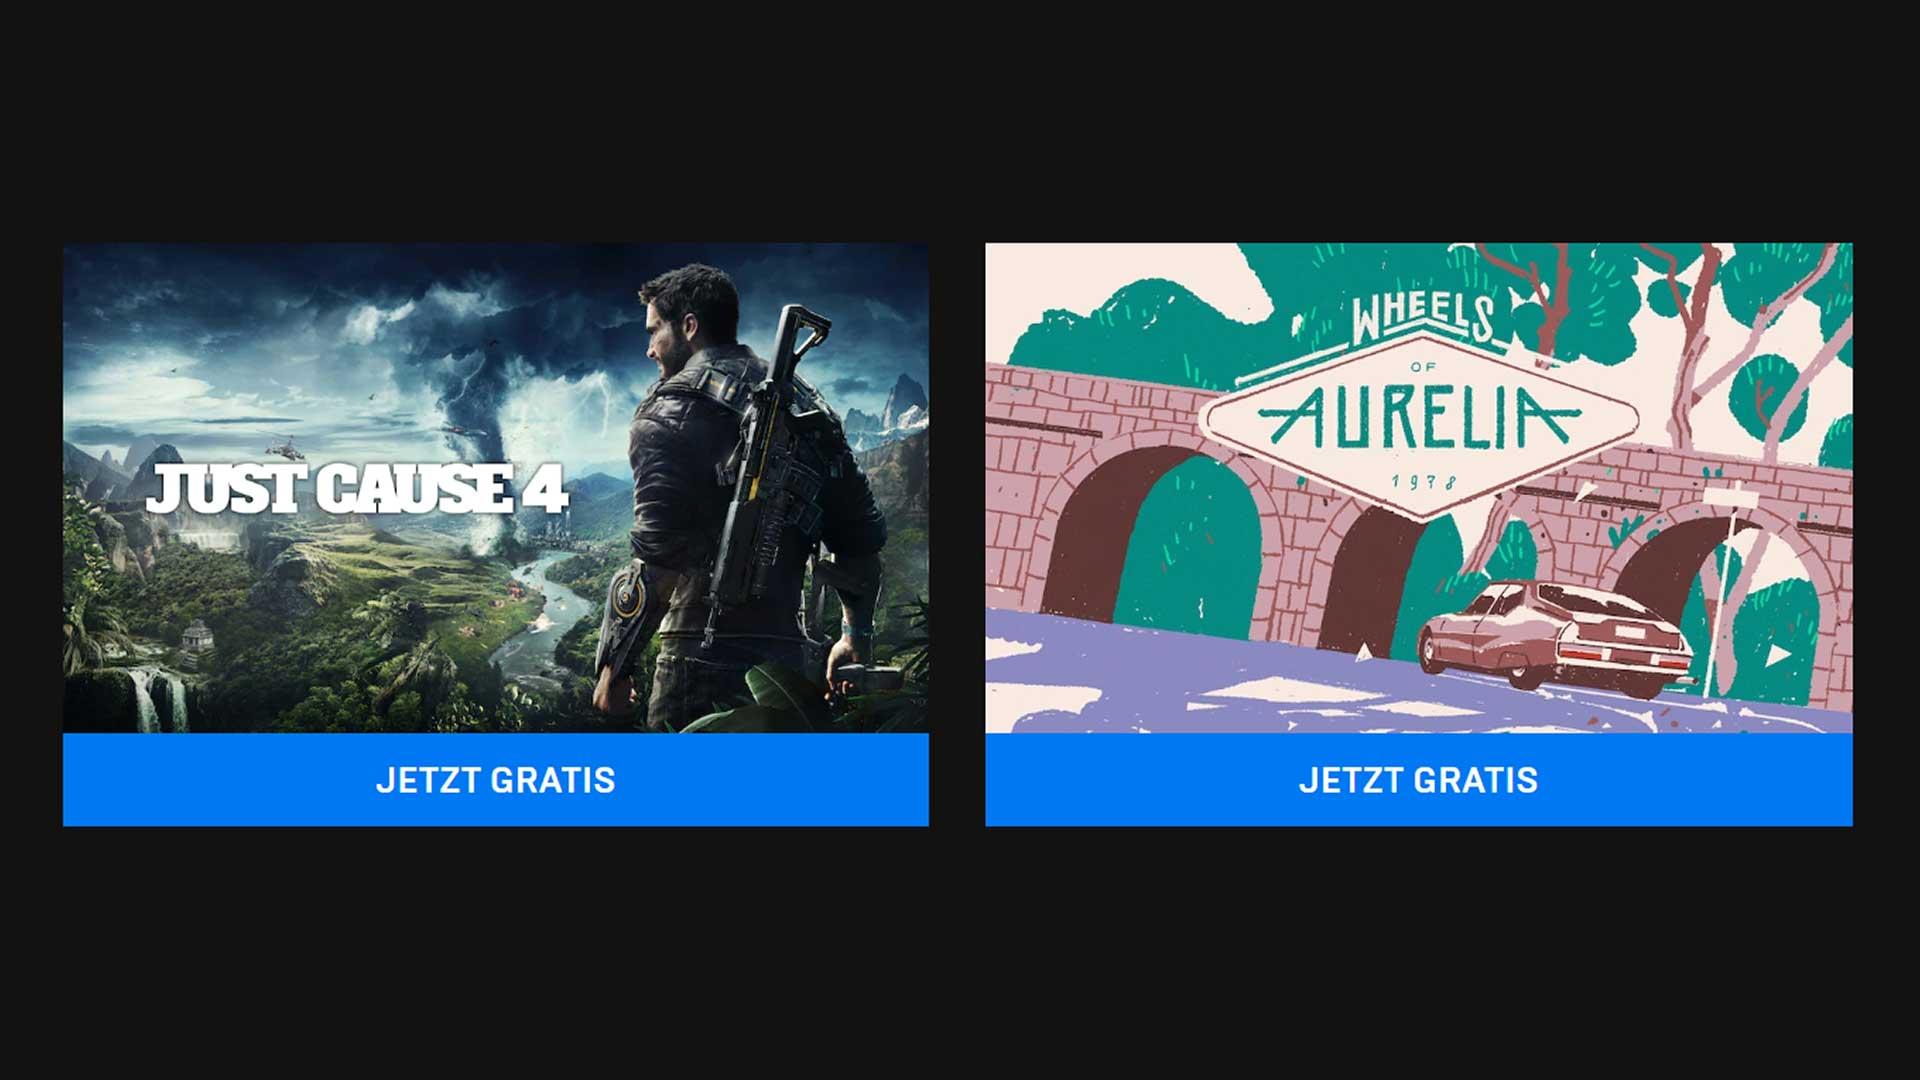 epic games just cause 4 gratis